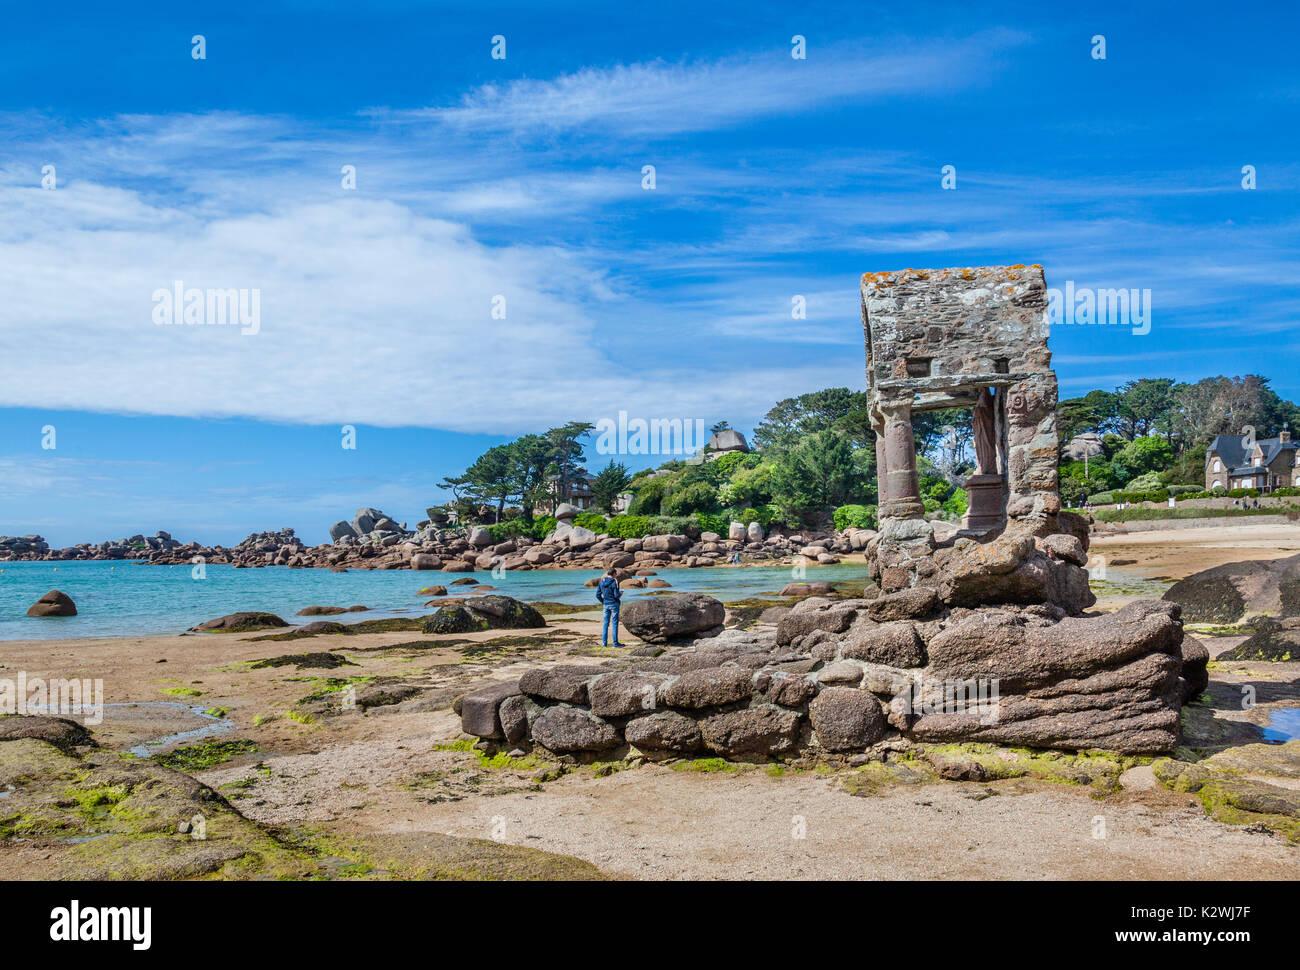 France, Brittany, Cotes d'Armor department, Cote de Granit Rose (Pink granite coast), Perros-Guirec, the Oratory Stock Photo